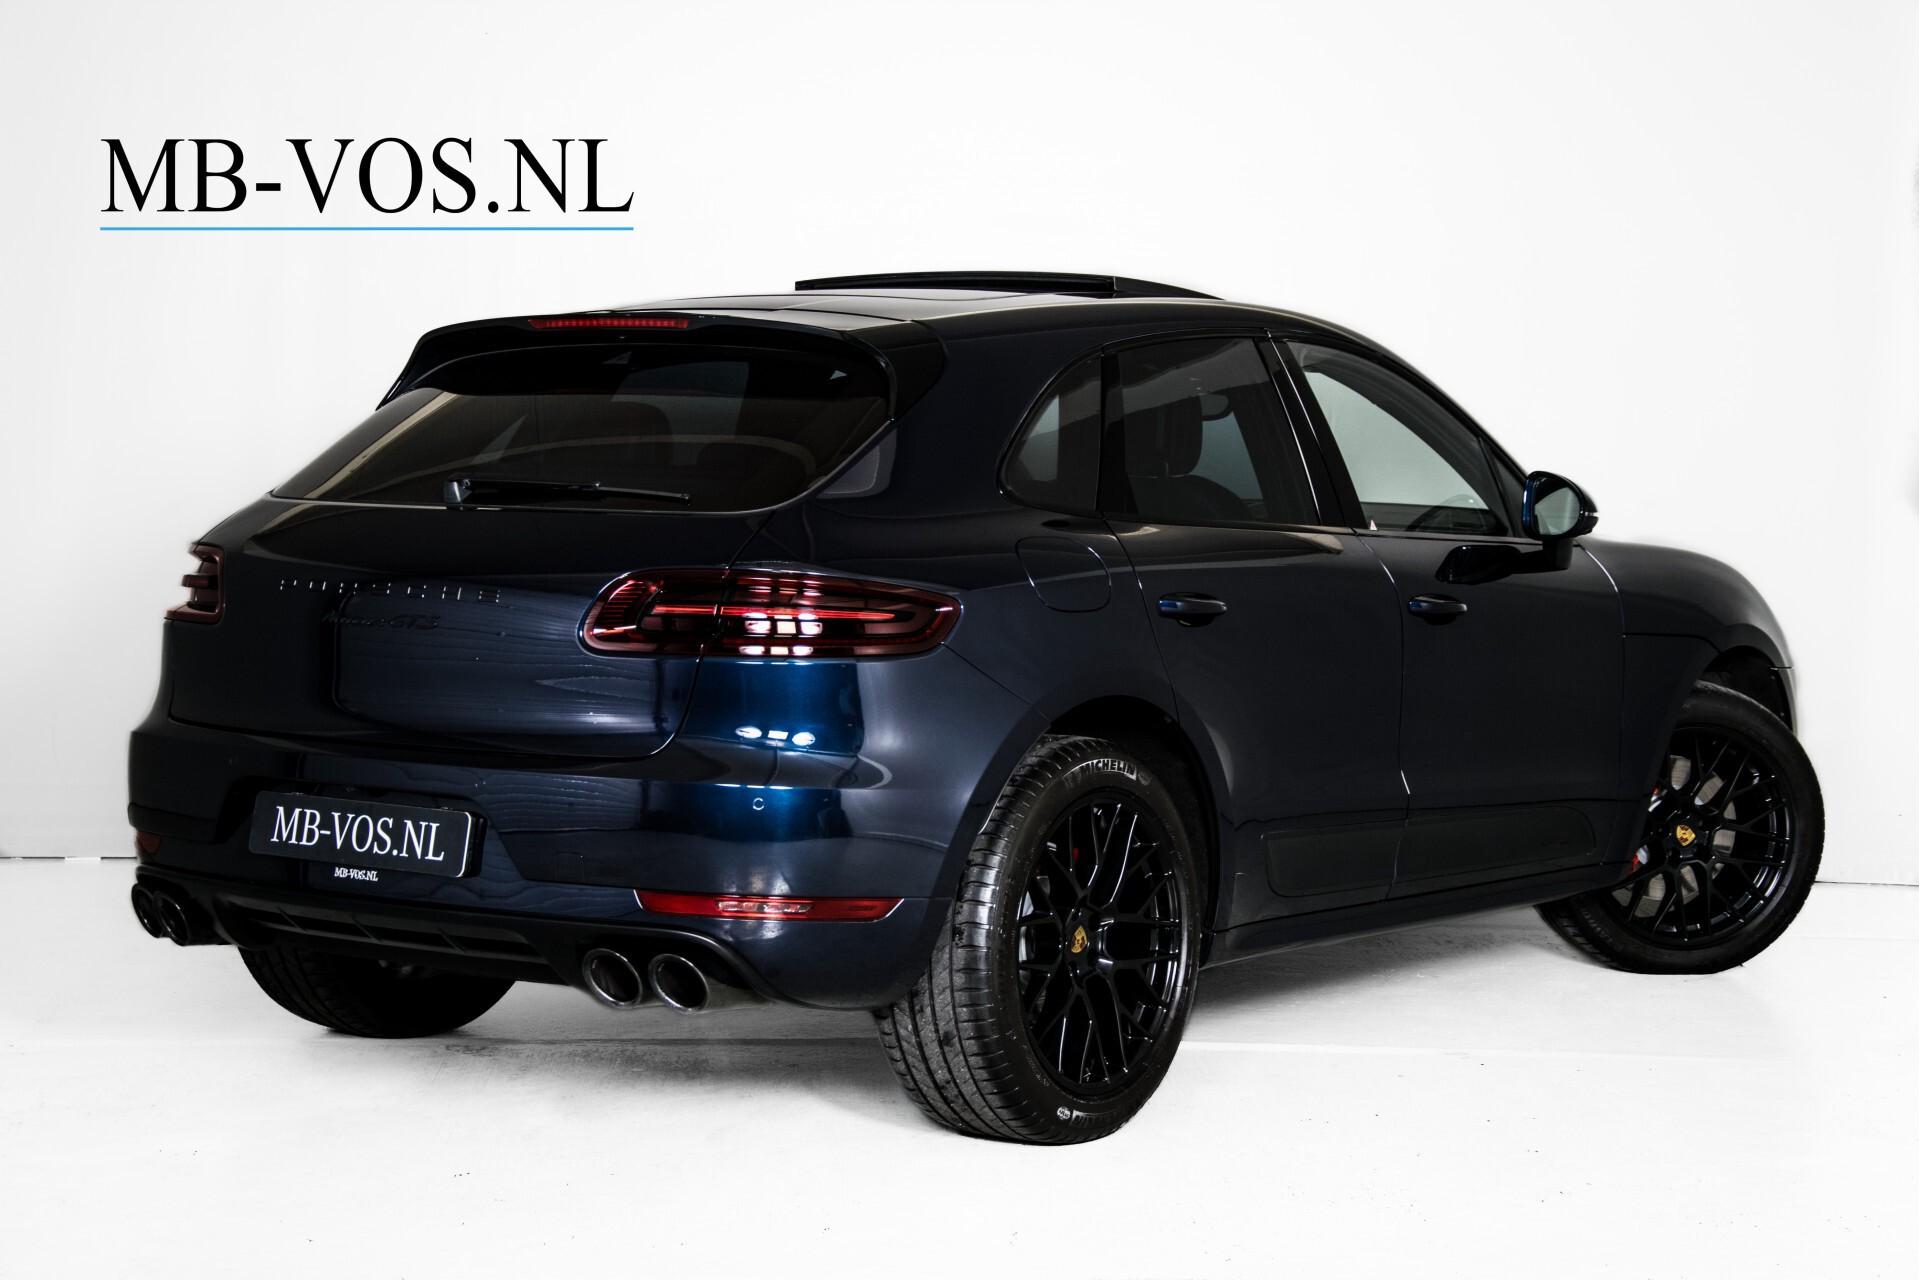 Porsche Macan 3.0 GTS Luchtvering/Panorama/Carbon/Bose/360-camera/Memory/PDLS Aut7 Foto 2